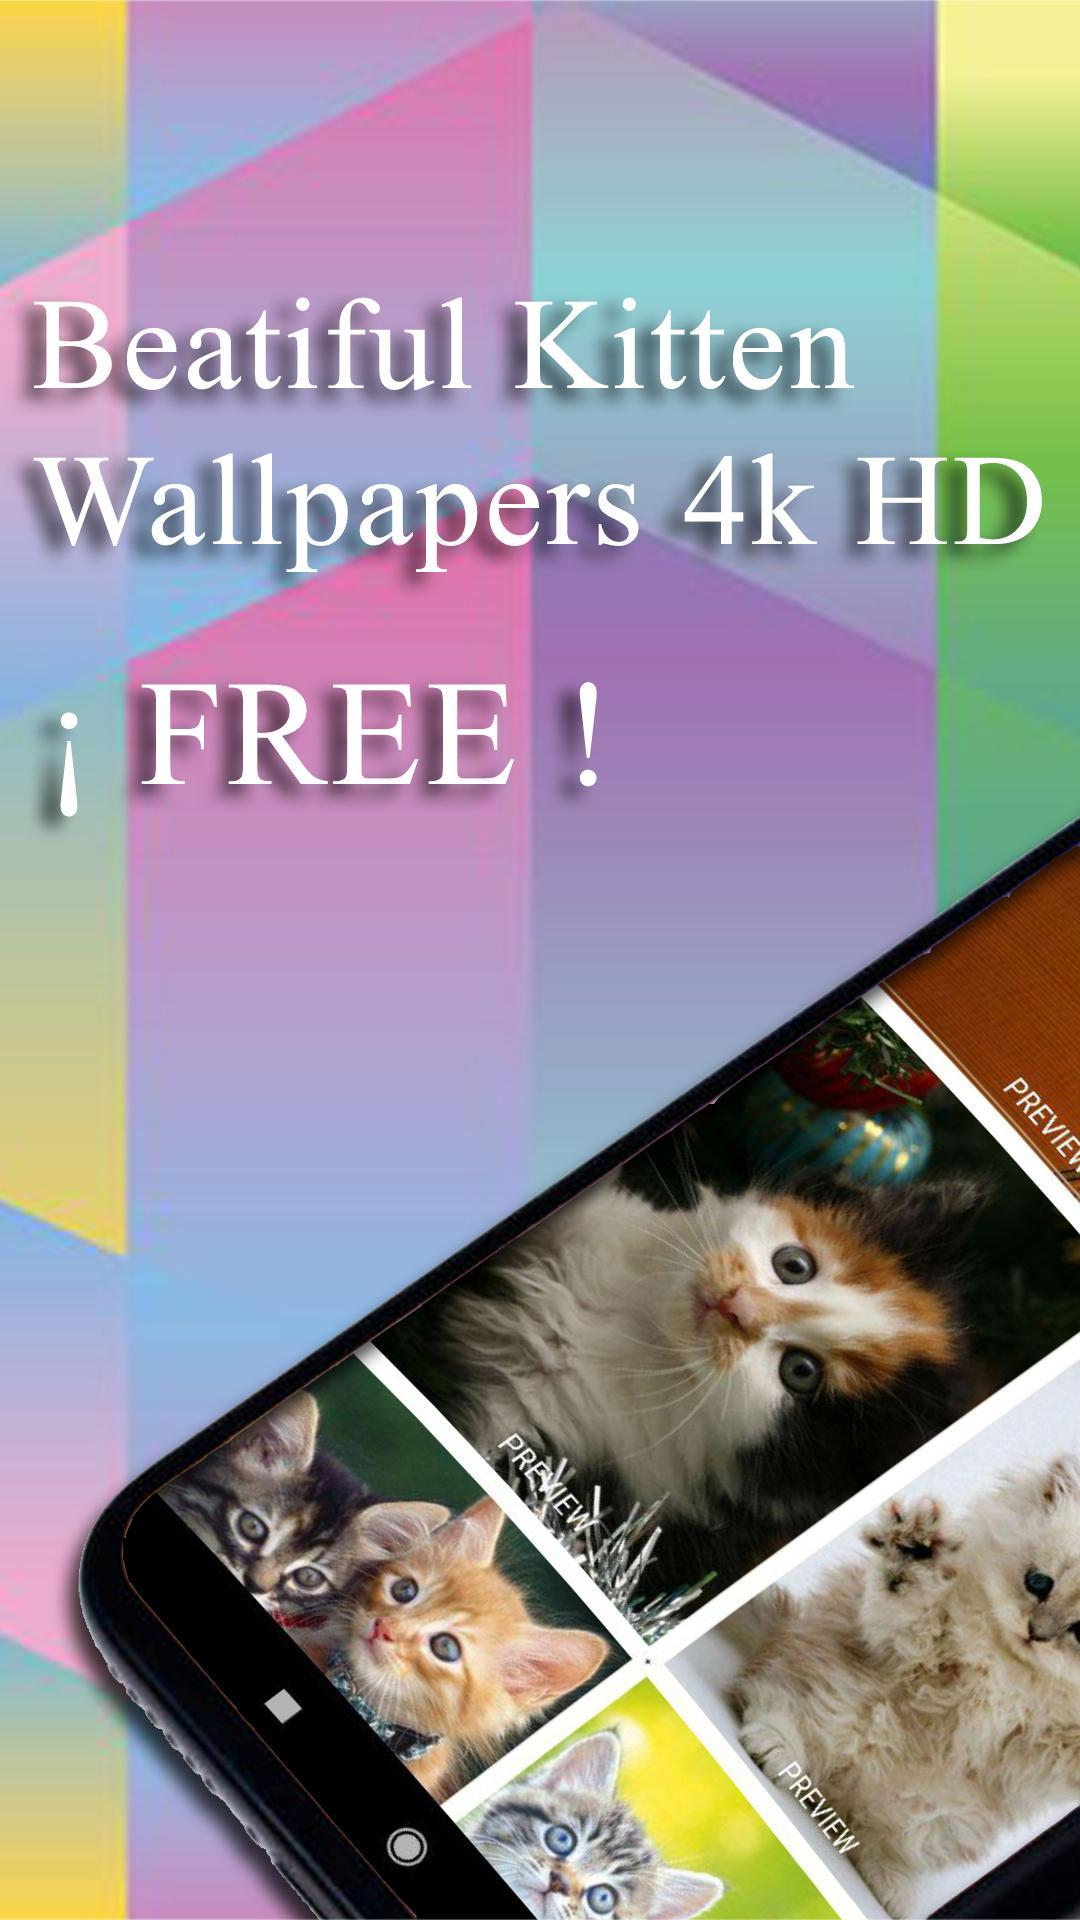 Kittens Wallpaper 4k Hd Fondos De Pantalla Gatos For Android Apk Download